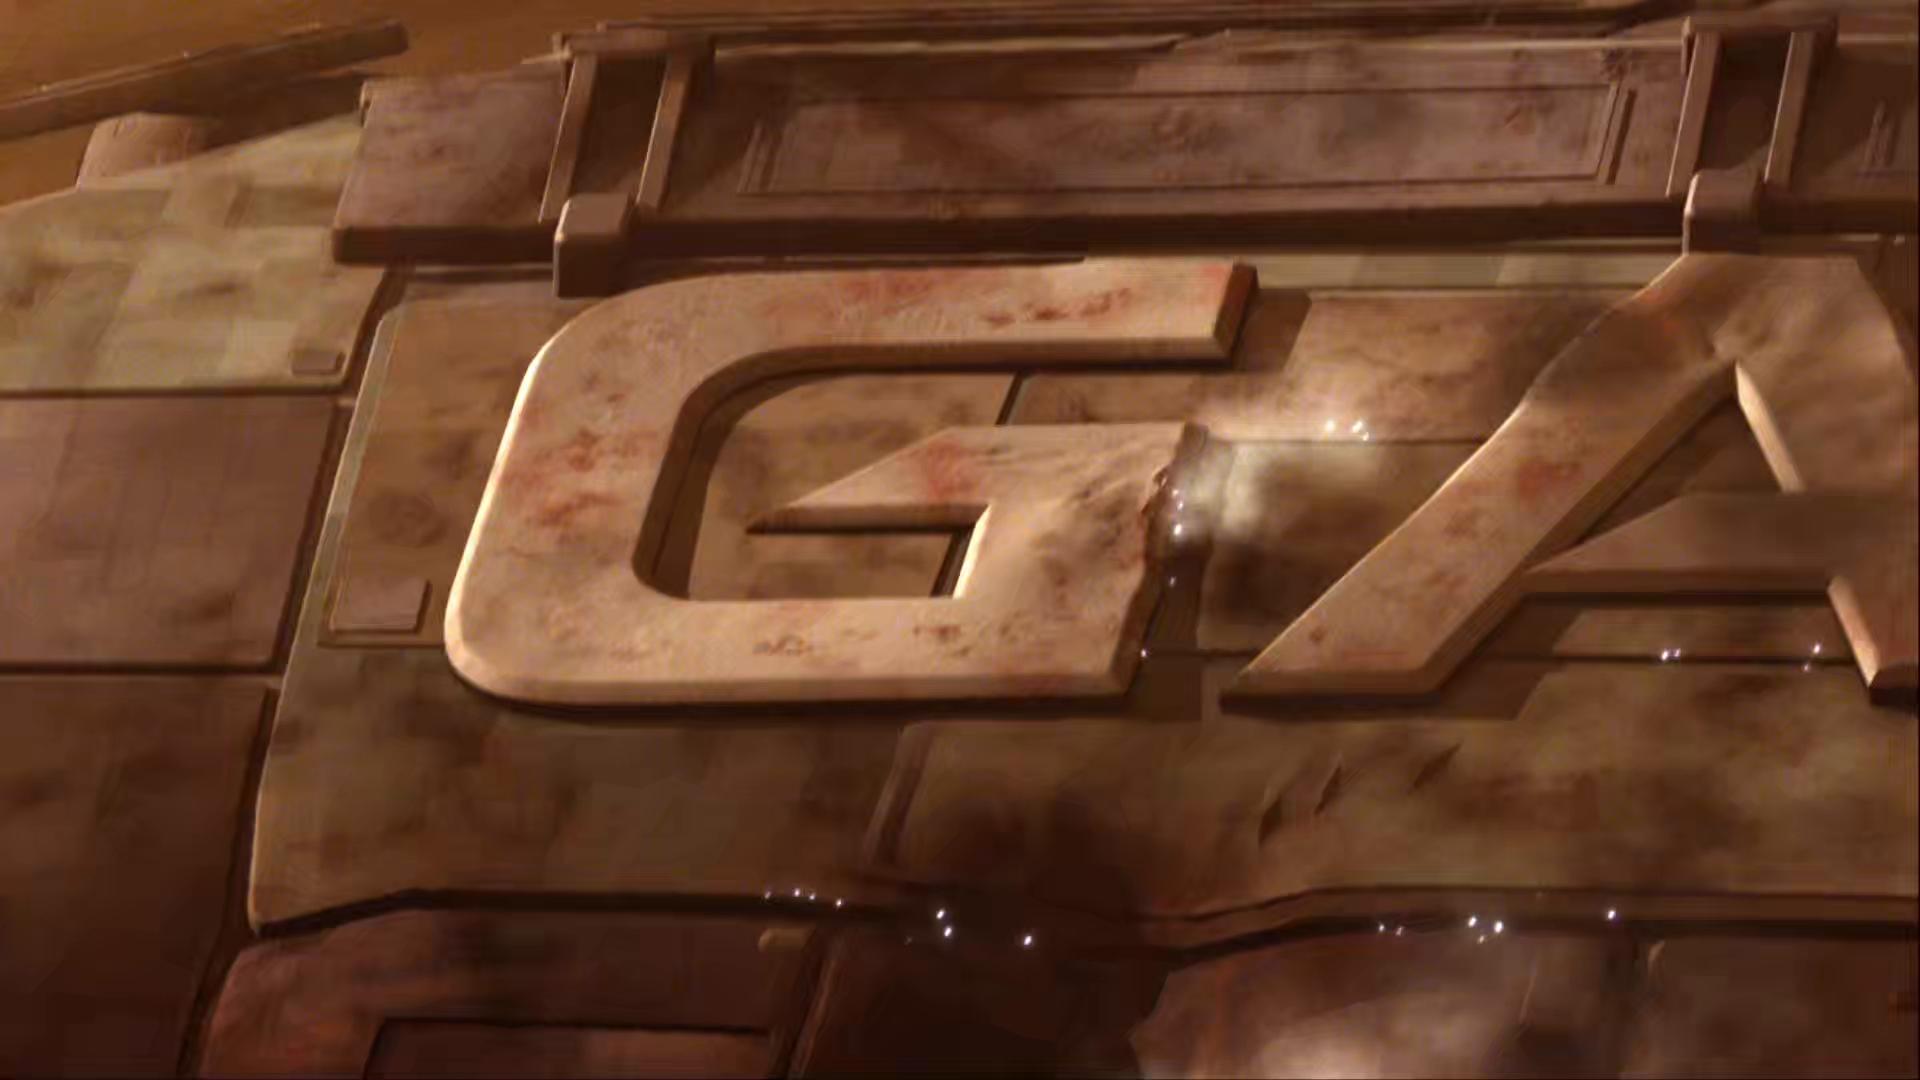 Battlestar.Galactica.2006.S03E10.The Passage.BluRay.1080p.Dts.HEVC-d3g.mkv_snapshot_17.35.000.jpg